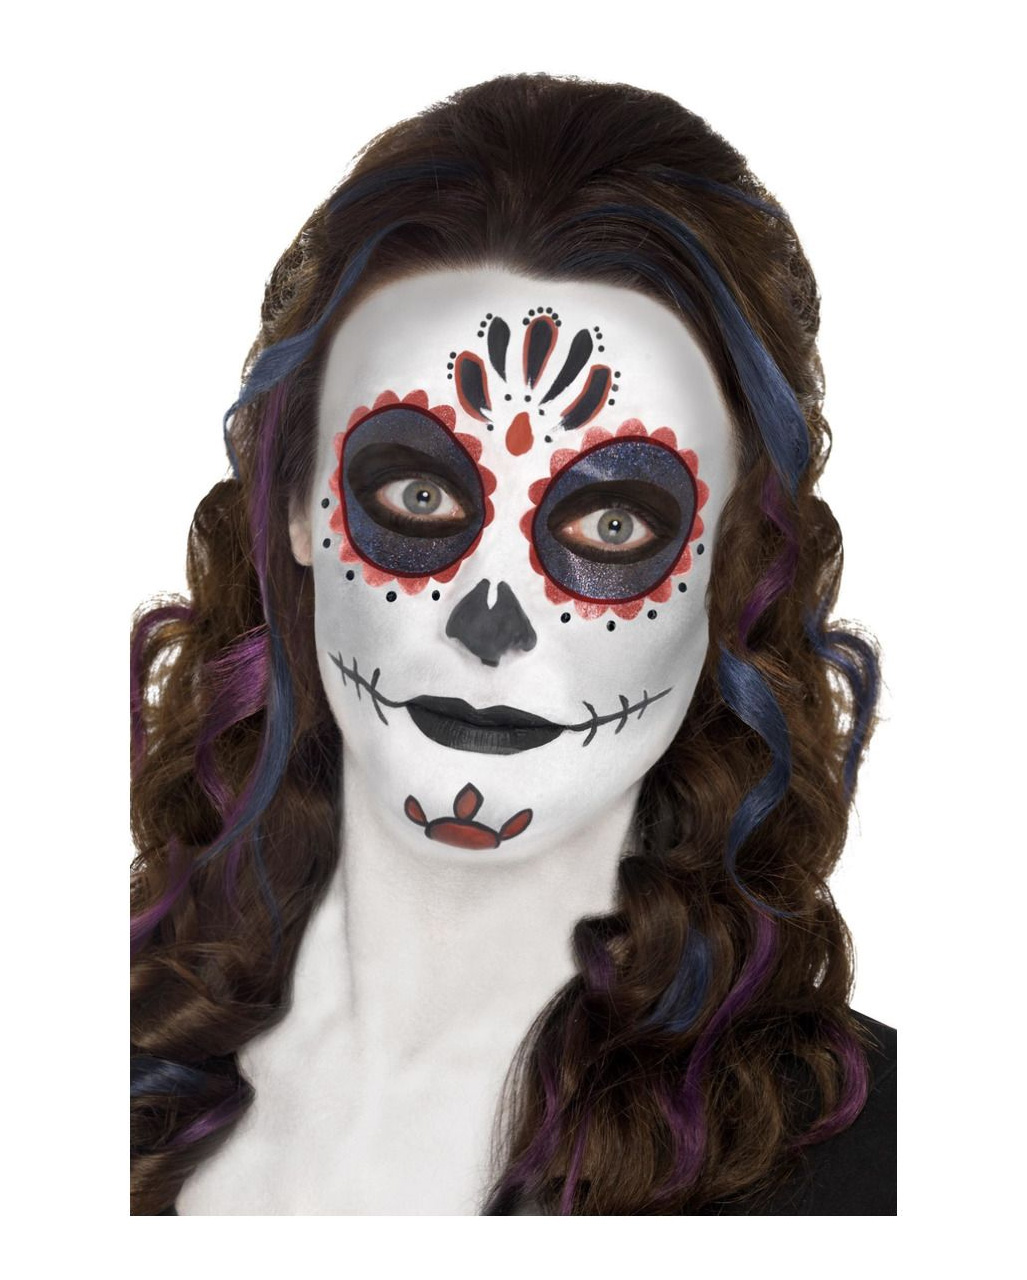 Halloween Schminke Deutsch.Day Of The Dead Makeup Set Complete Make Up Set With Accessories Horror Shop Com